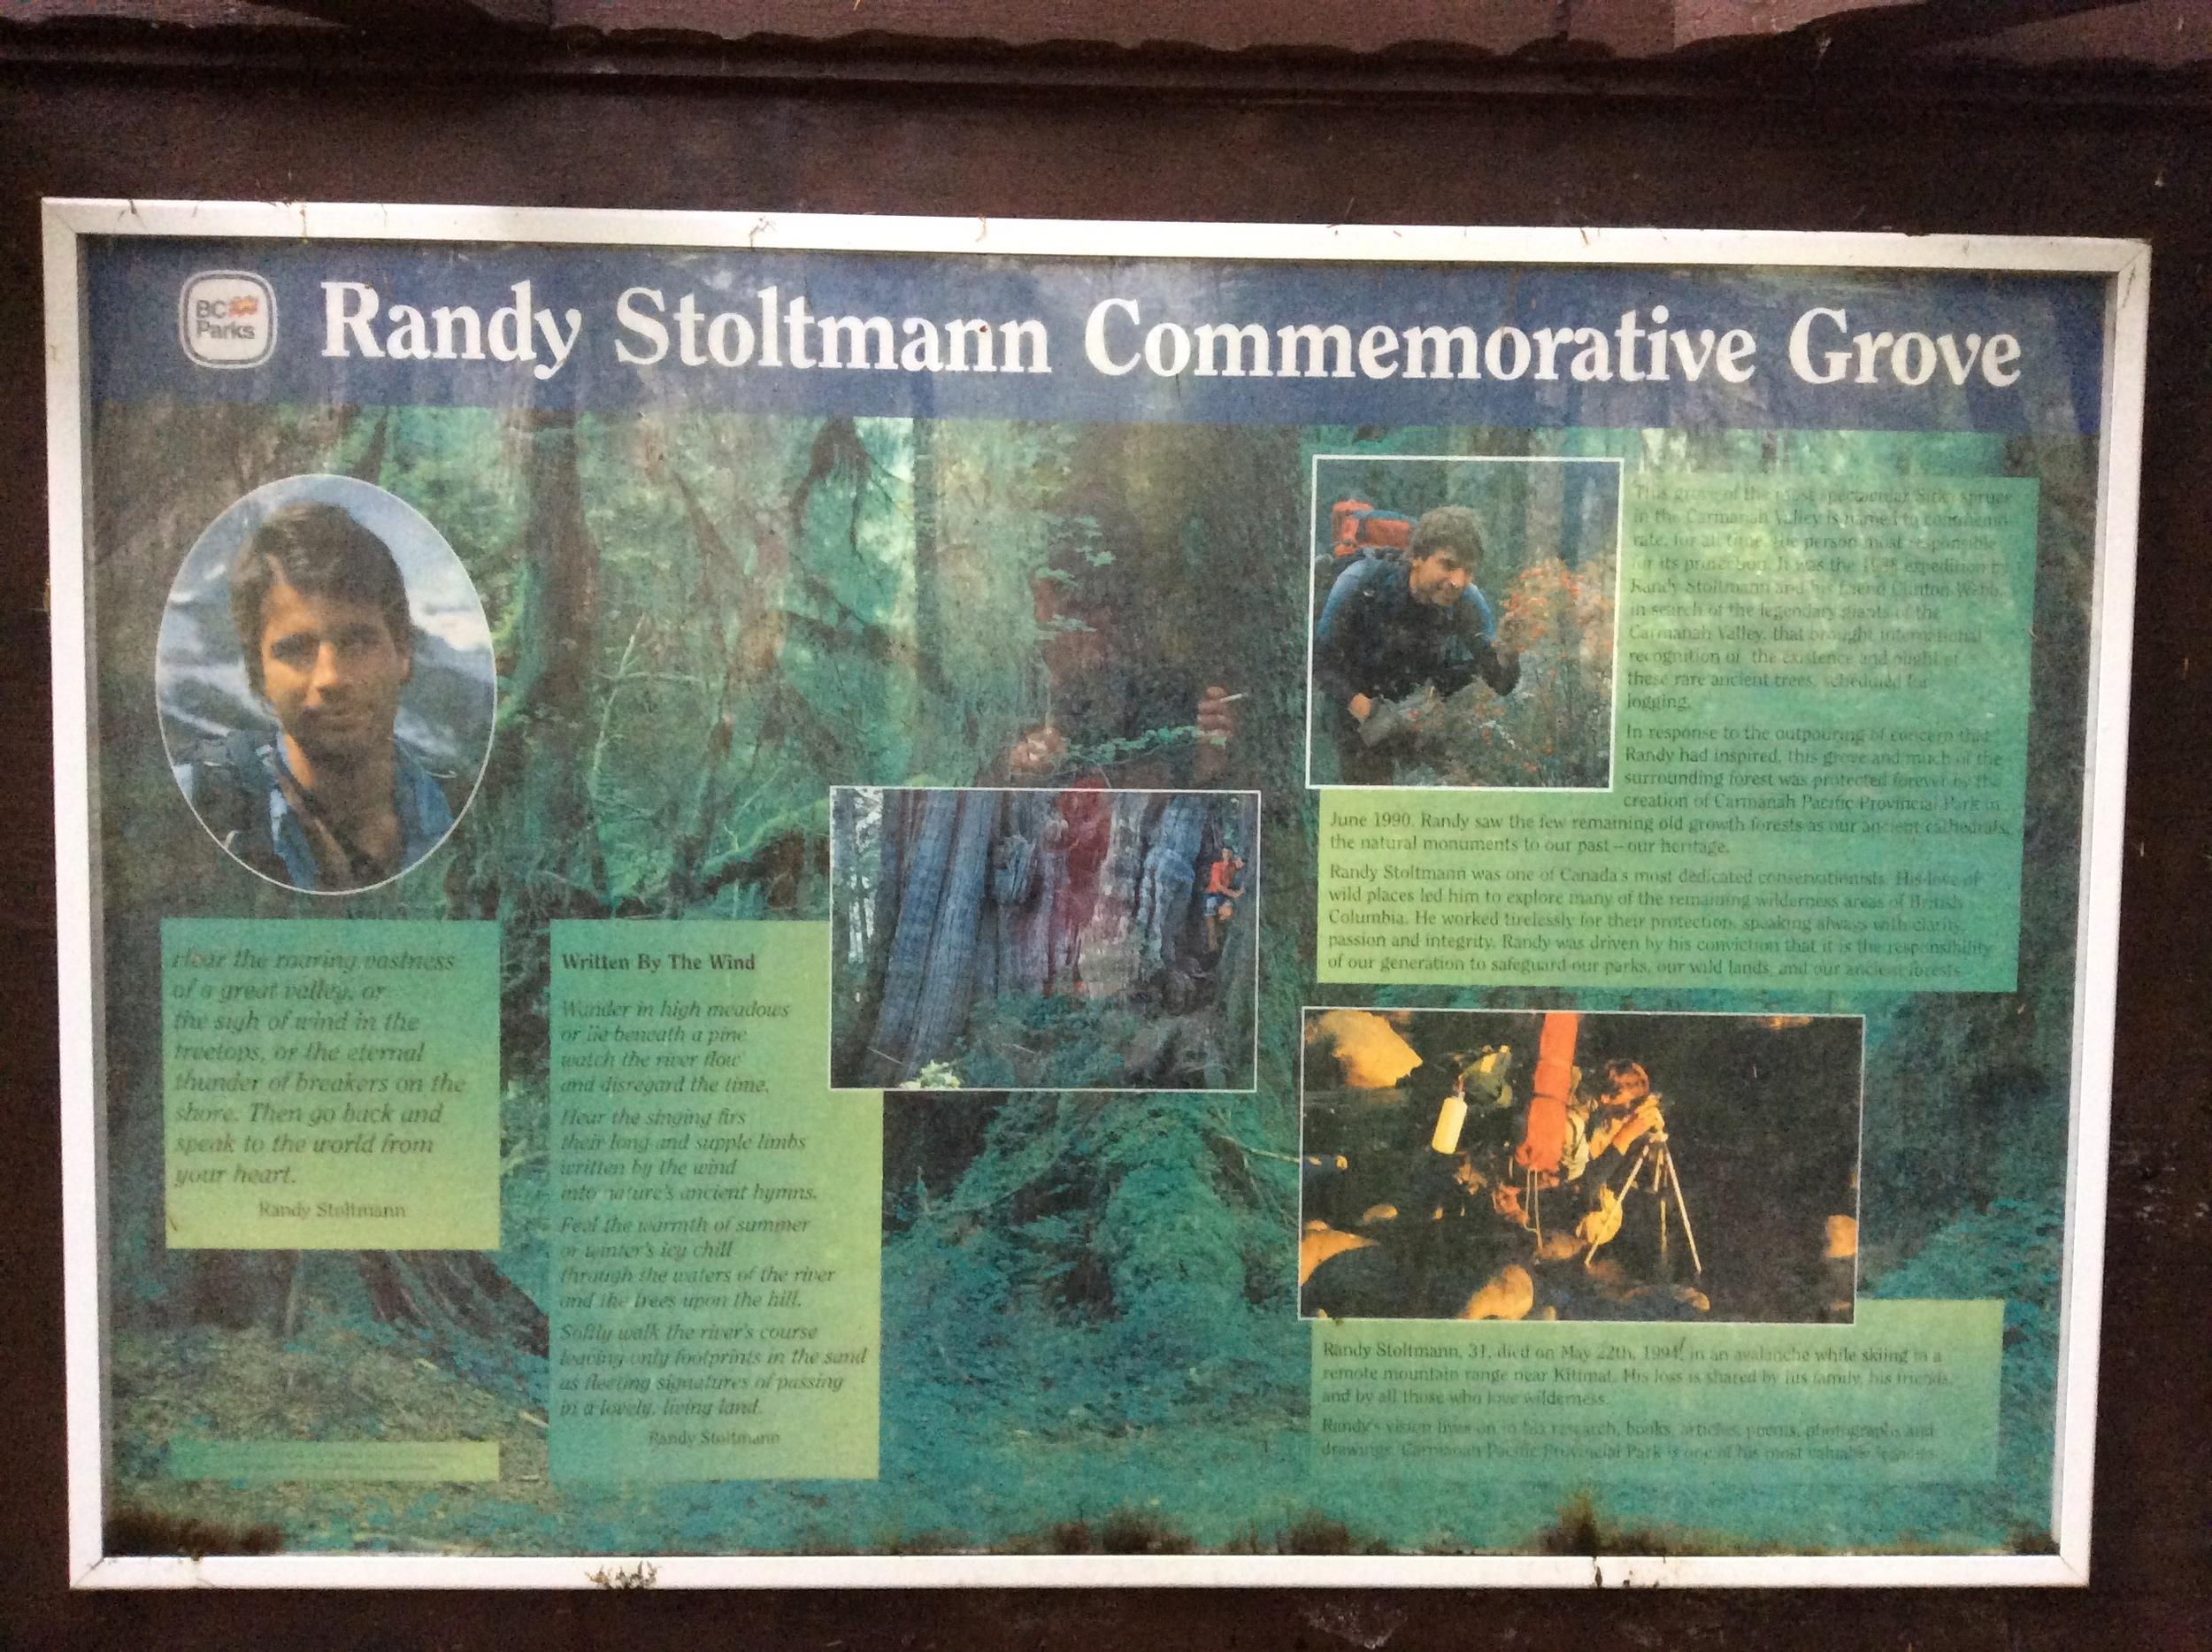 Randy Stoltmann, what a story